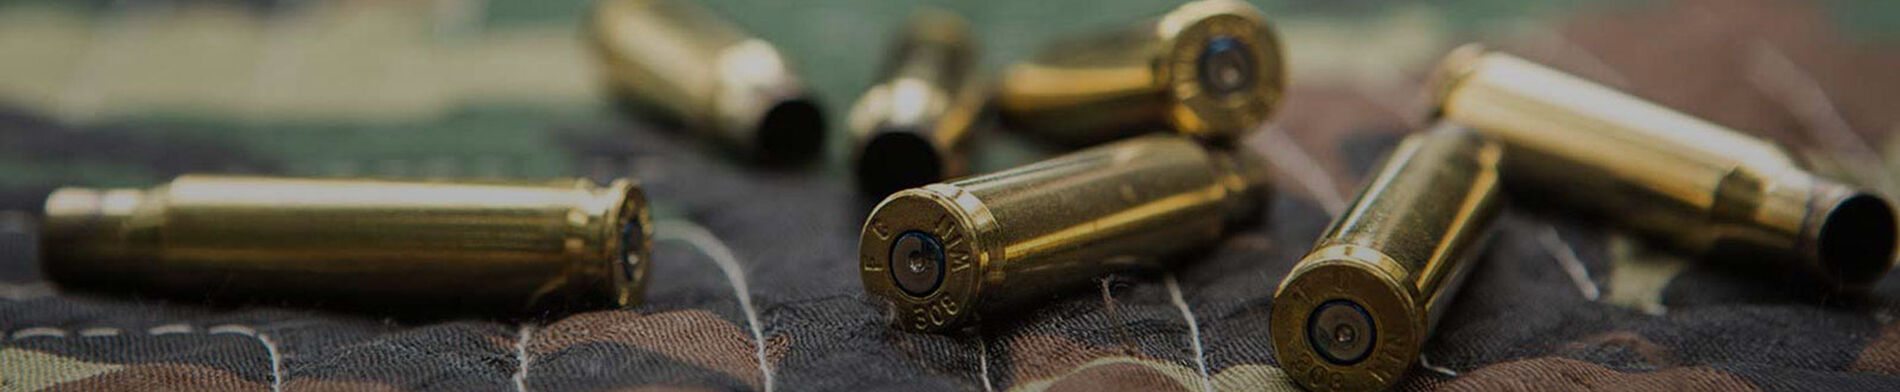 Ammunition Cases